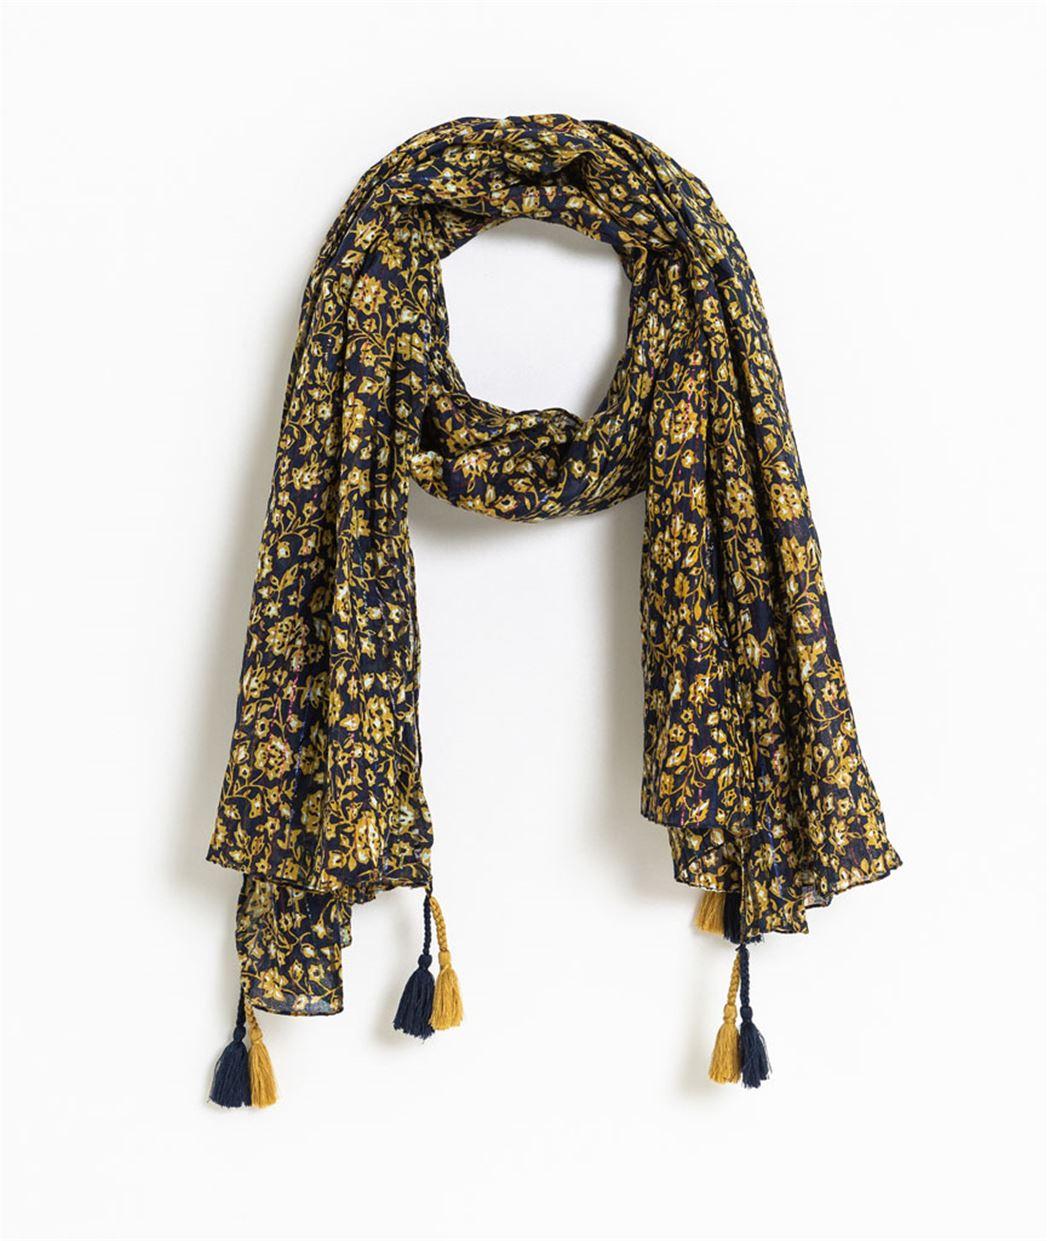 98837057054ab Foulard femme marine motifs fleuris BLEU - Grain de Malice